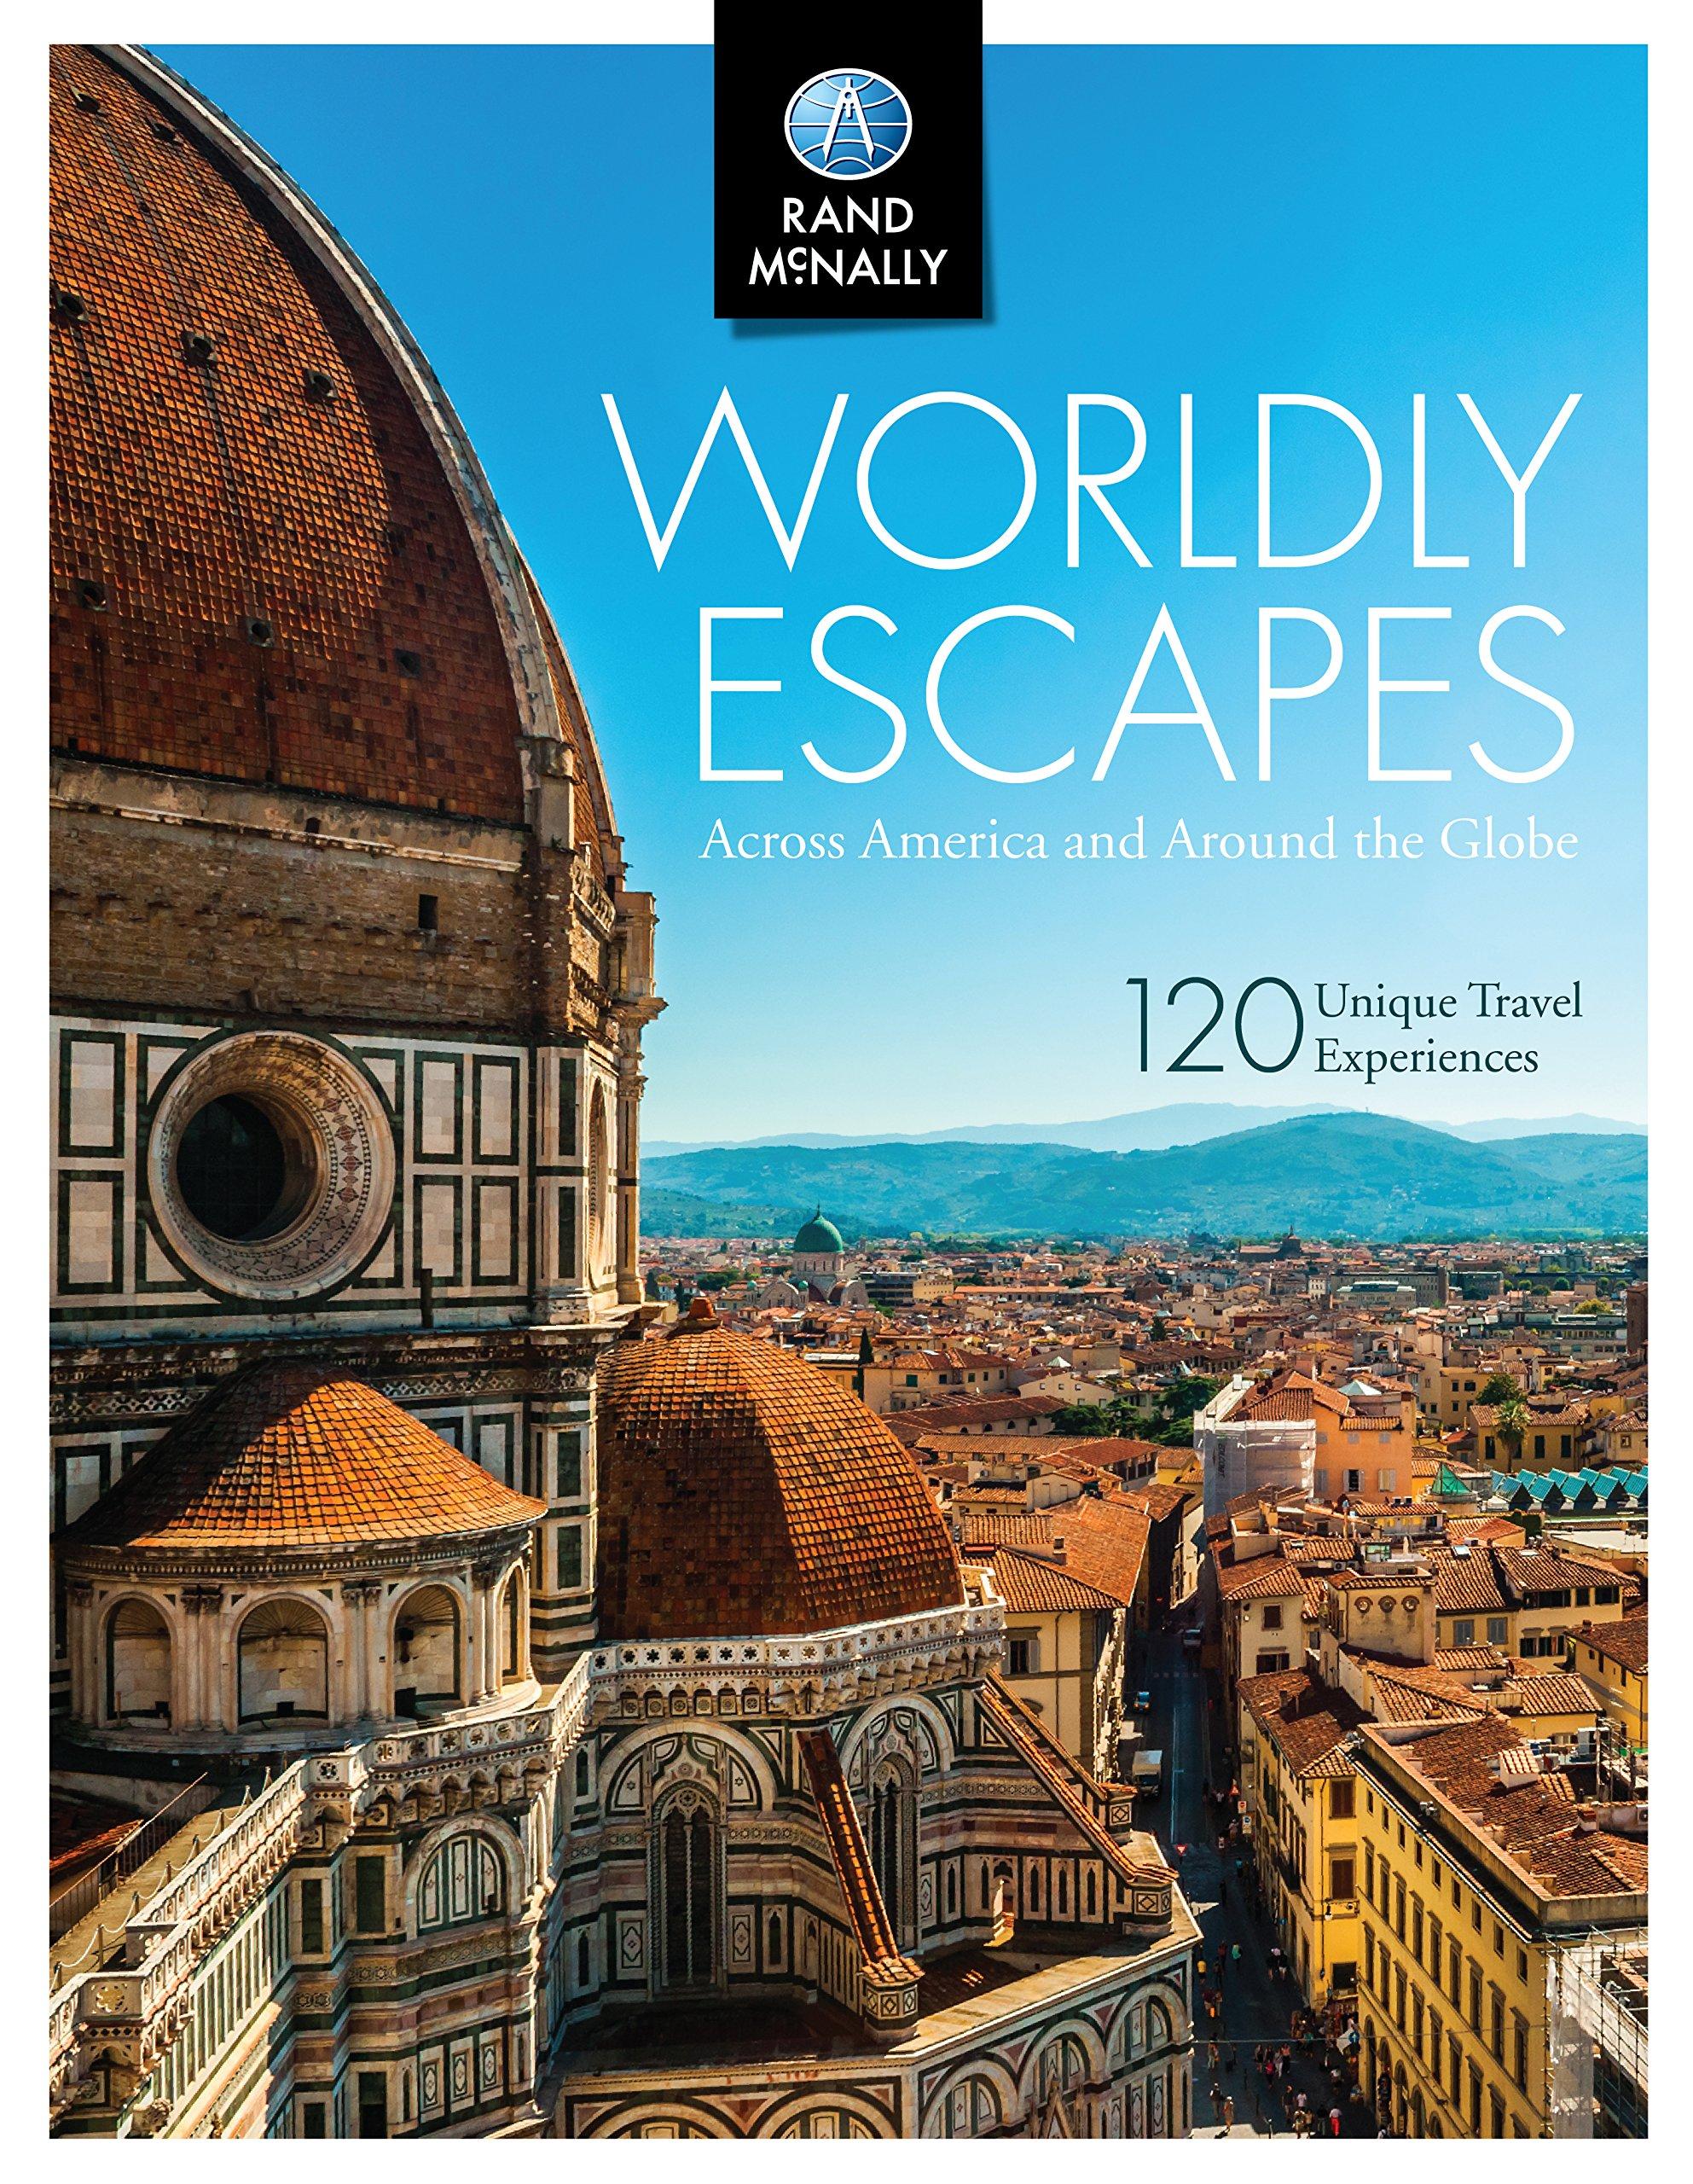 Worldly Escapes Rand McNally Amazon Books